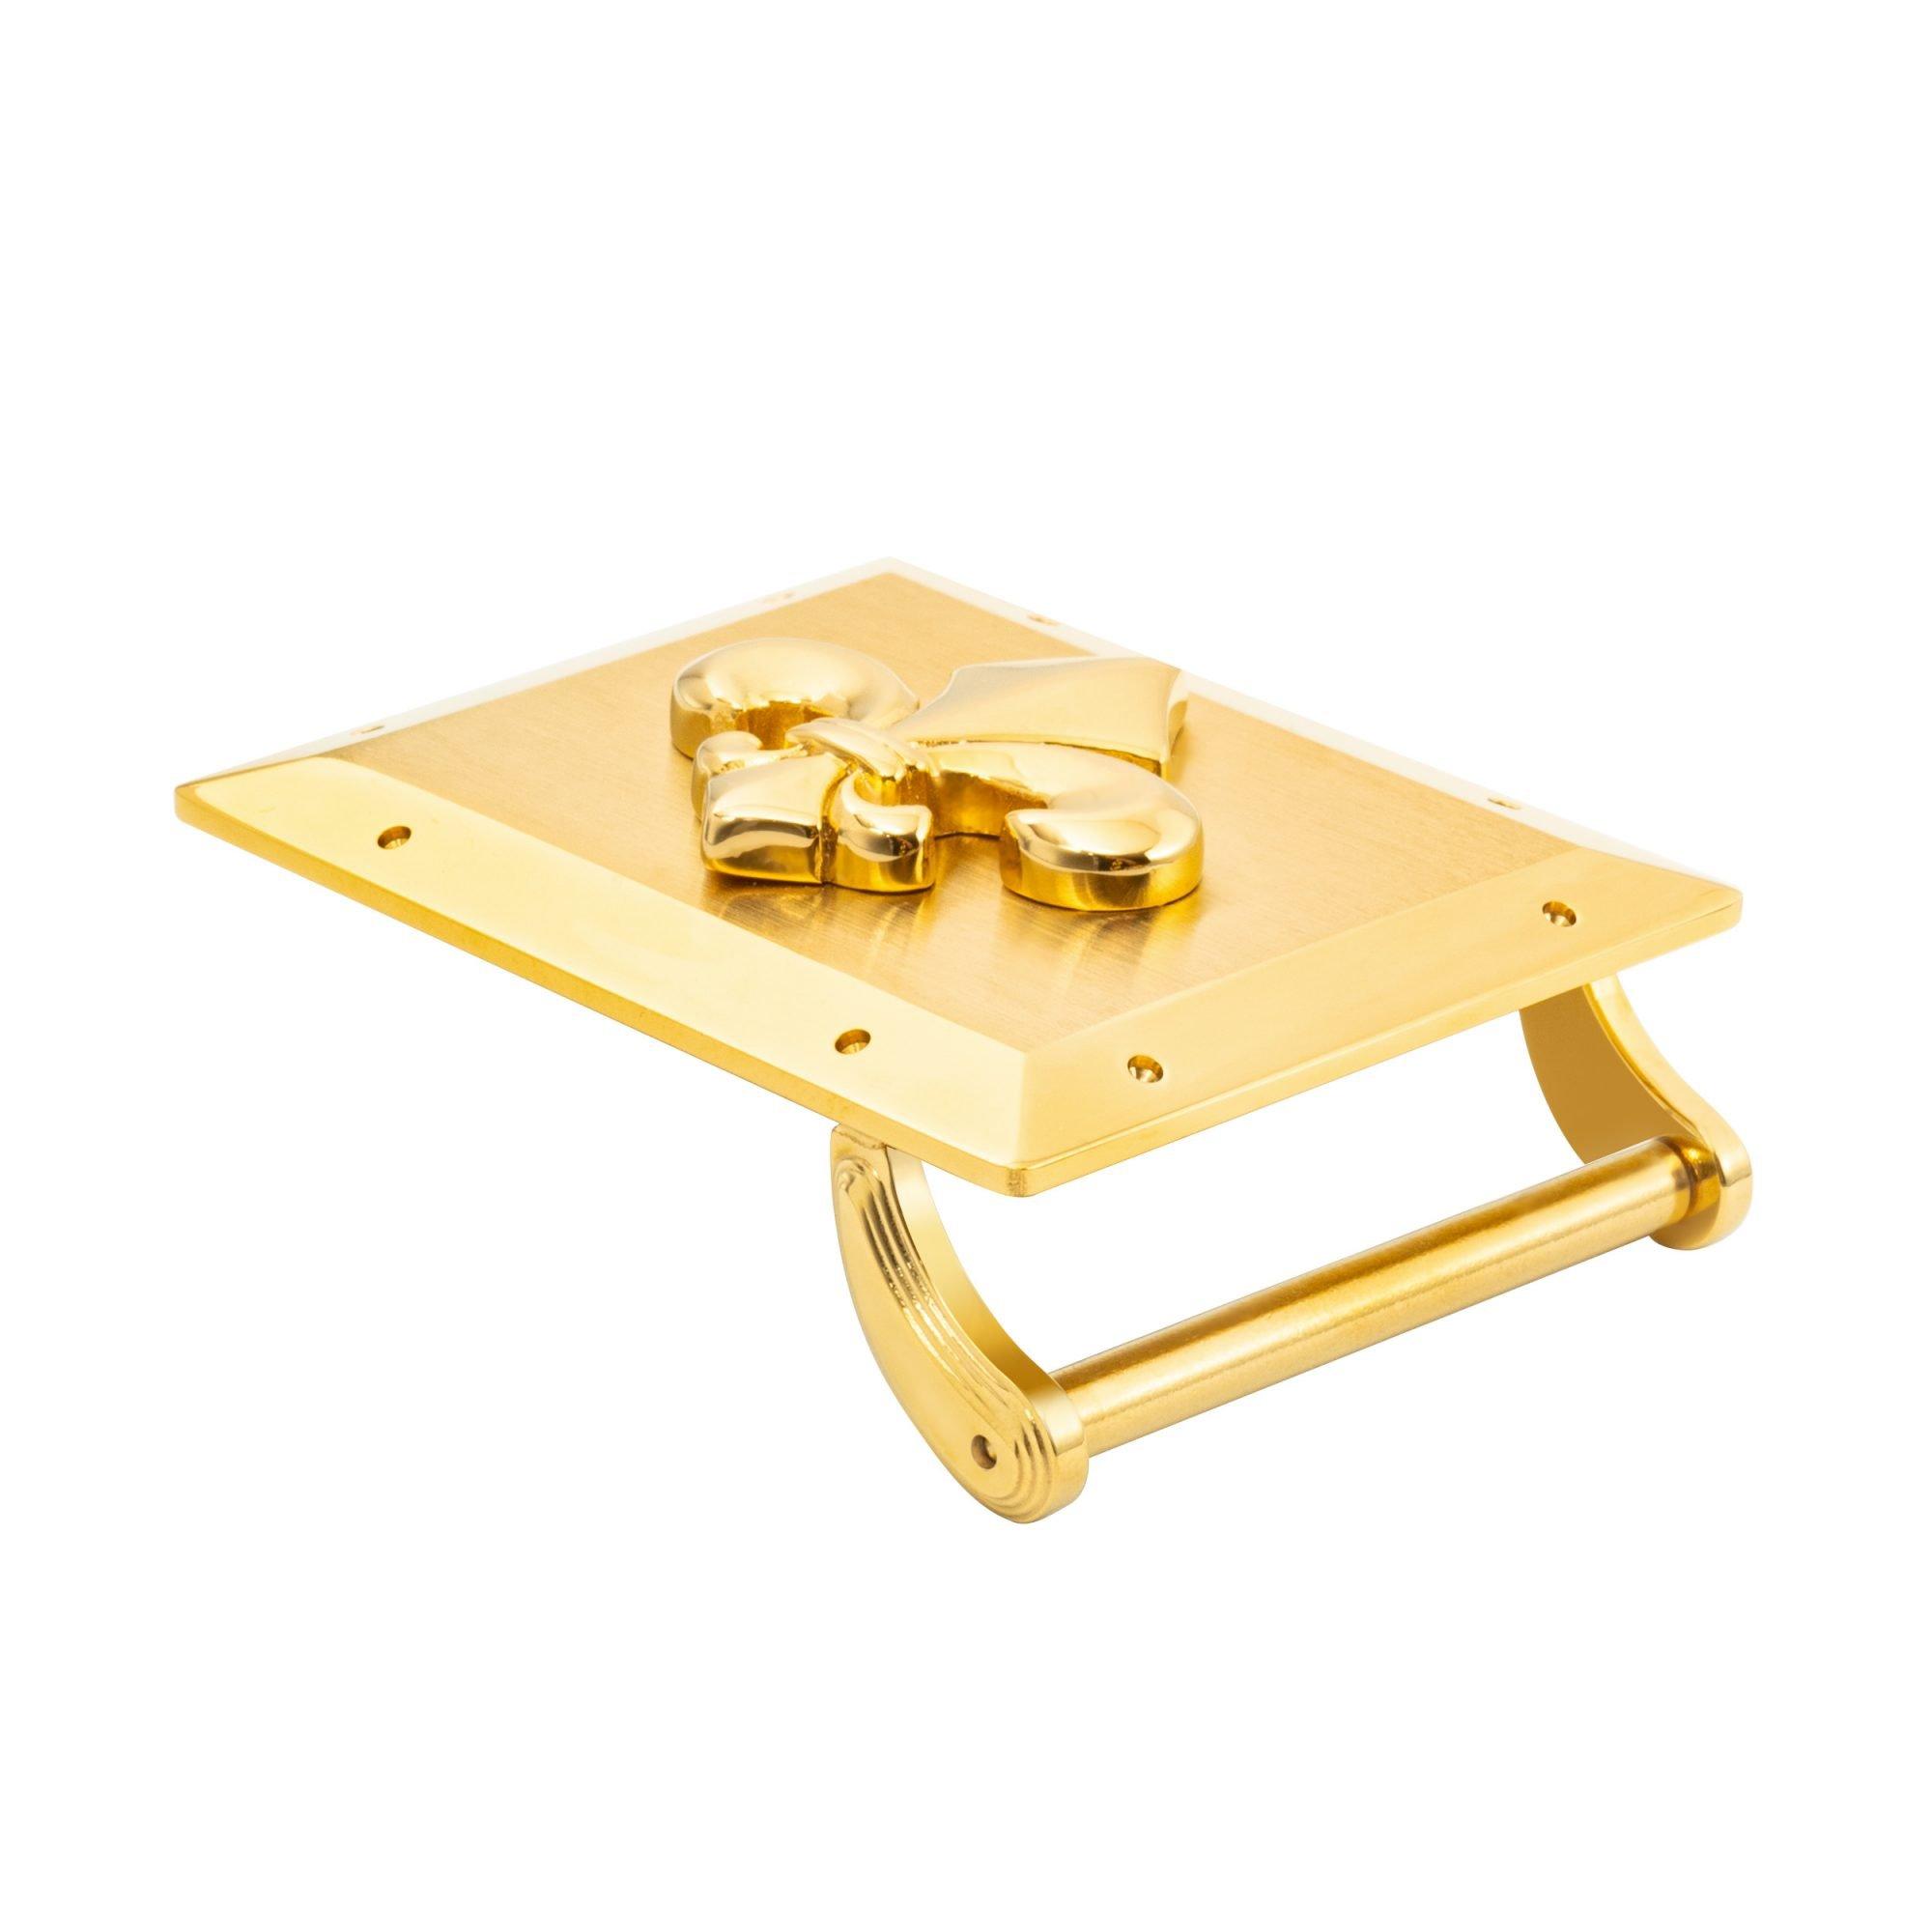 VIKTOR ALEXANDER 38MM STAINLESS STEEL BELT BUCKLE FLEUR DE LIS YELLOW GOLD SIDE PROFILE